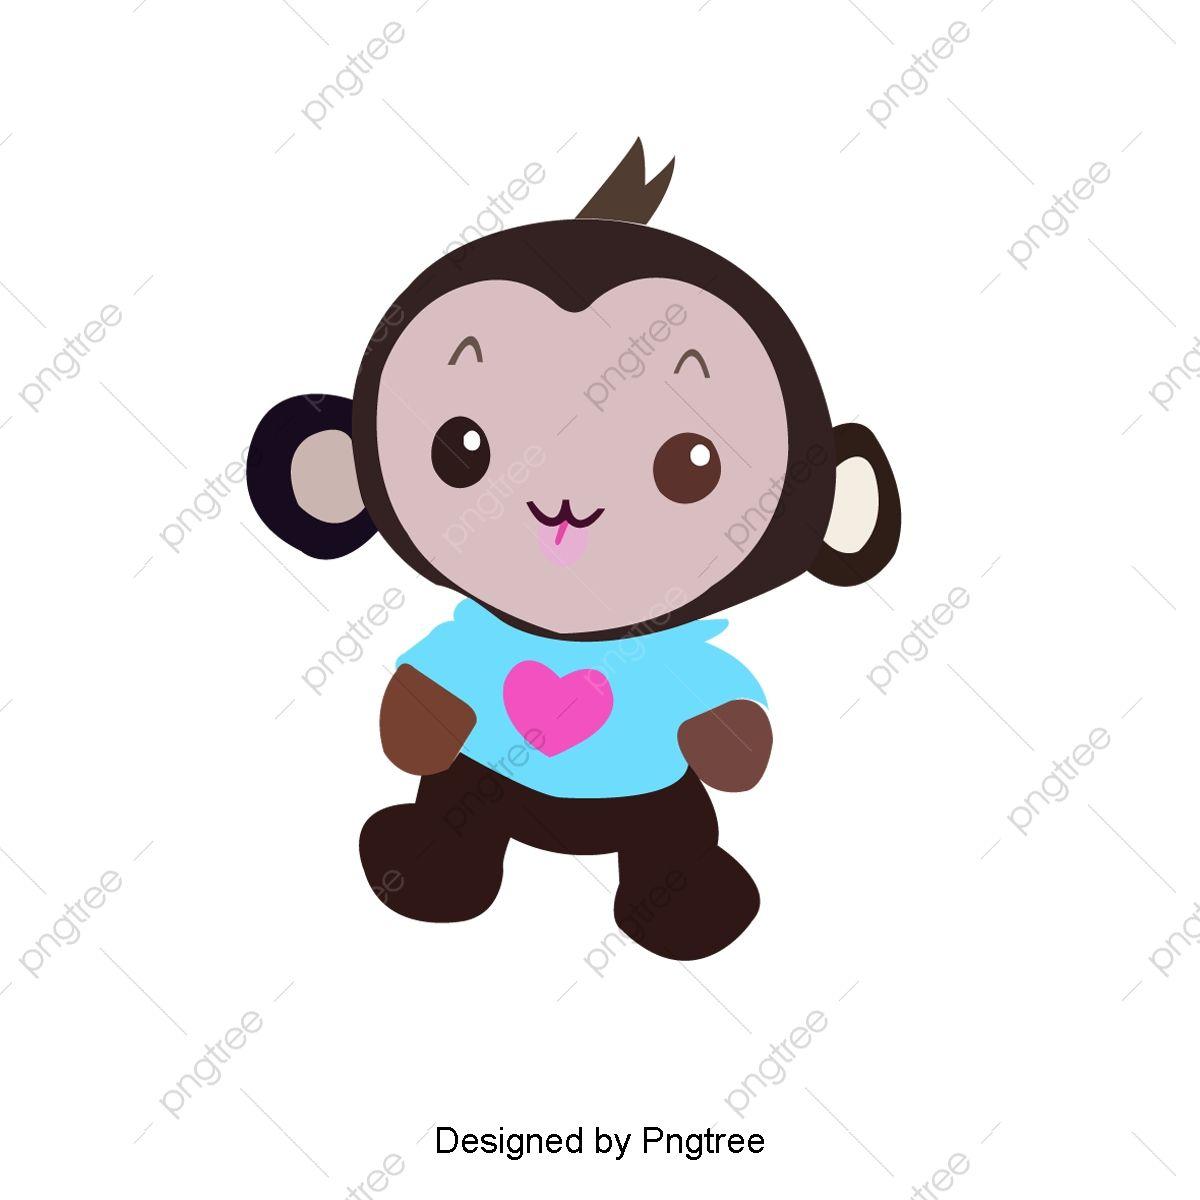 Happy Little Monkey Monkey Clipart Cartoon Comics Animal